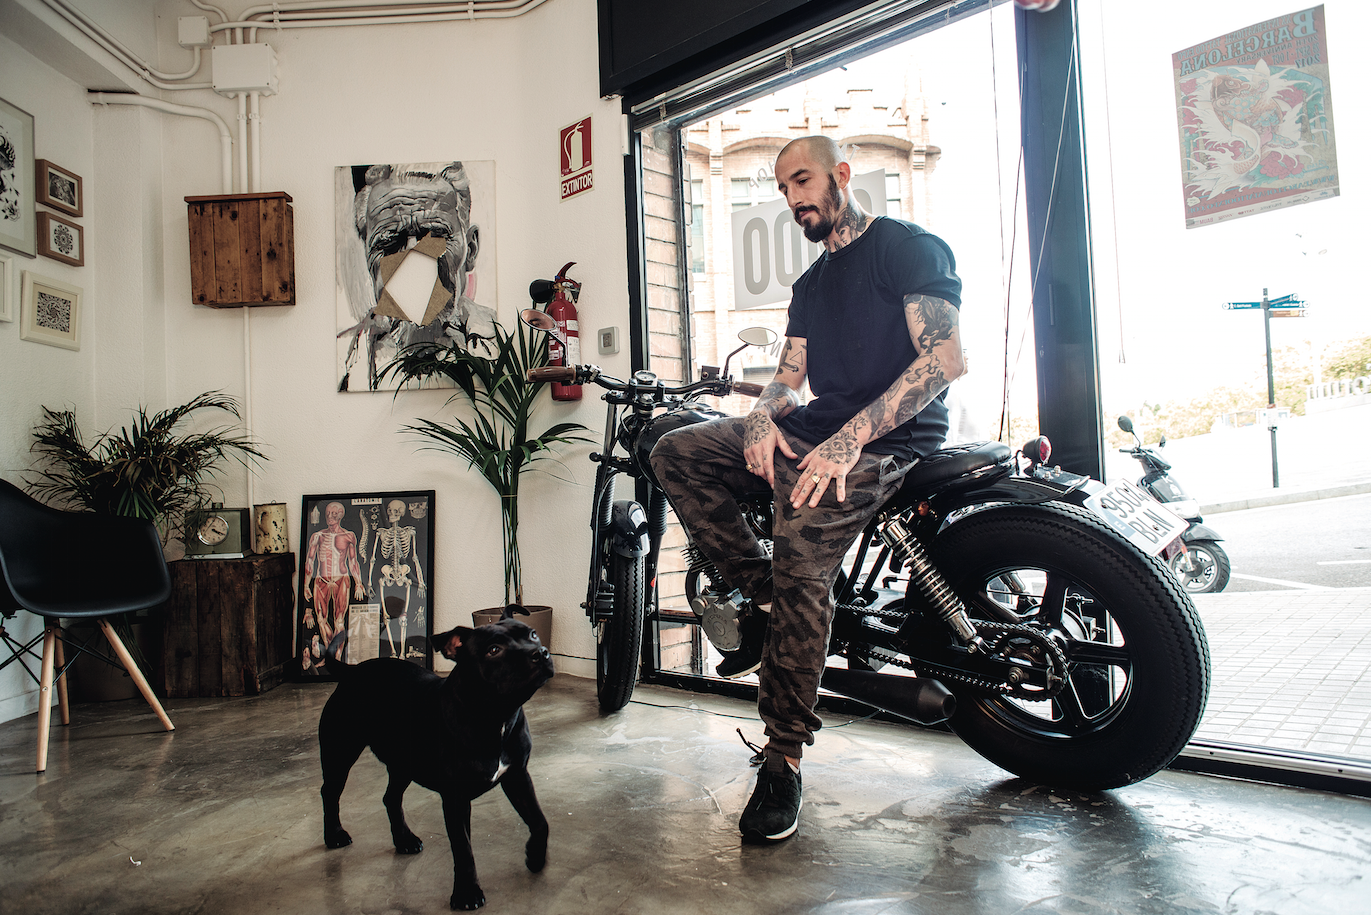 Los mejores estudios de tatuaje de Barcelona